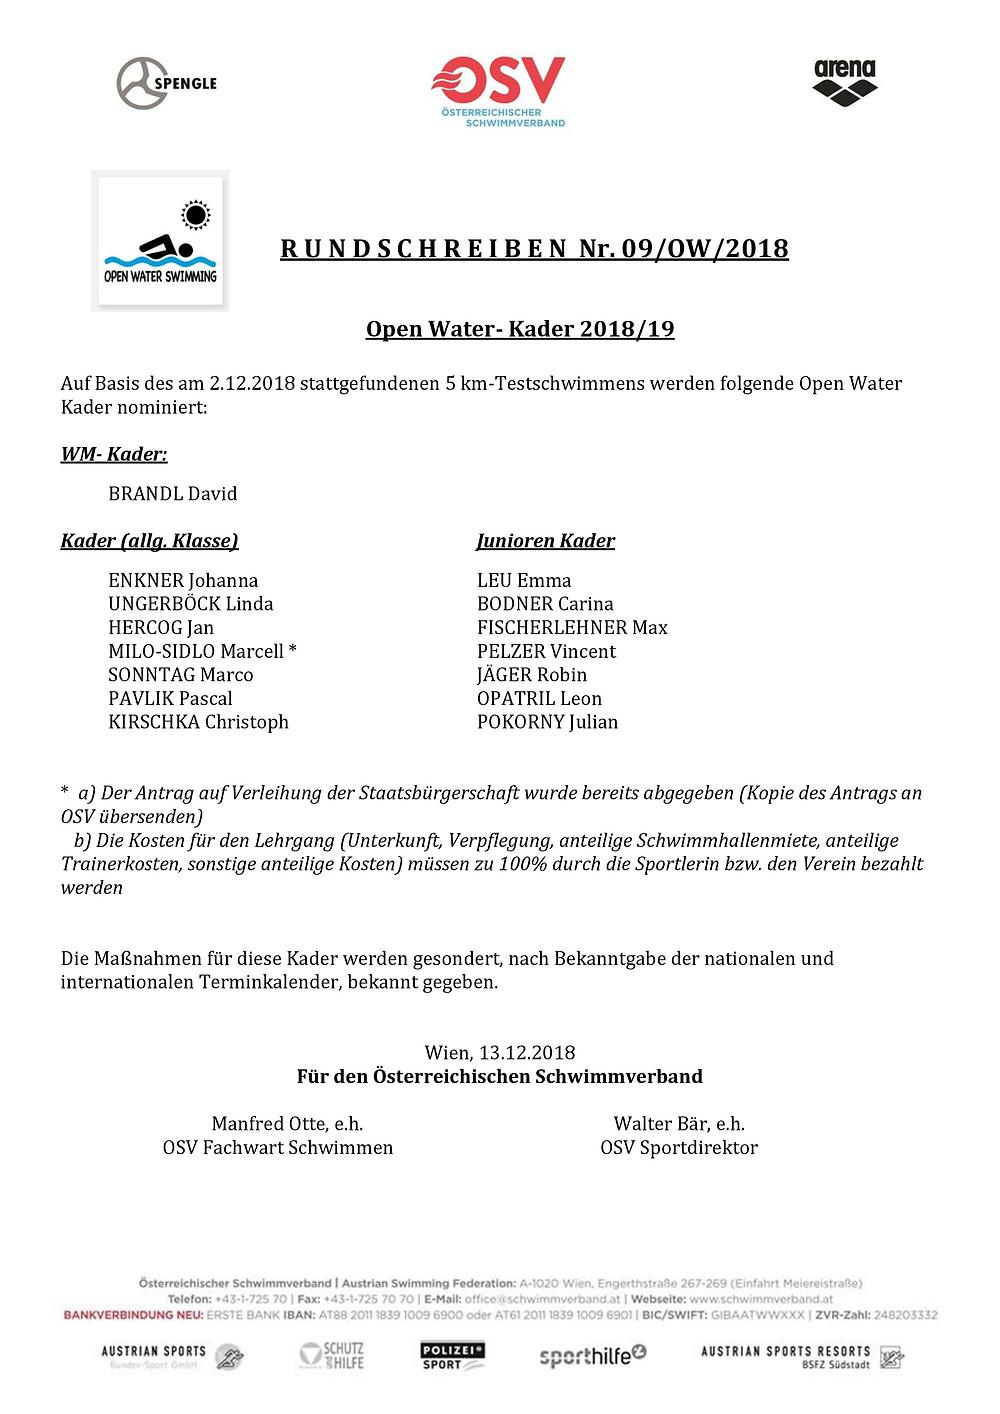 Open Water Kader 2019